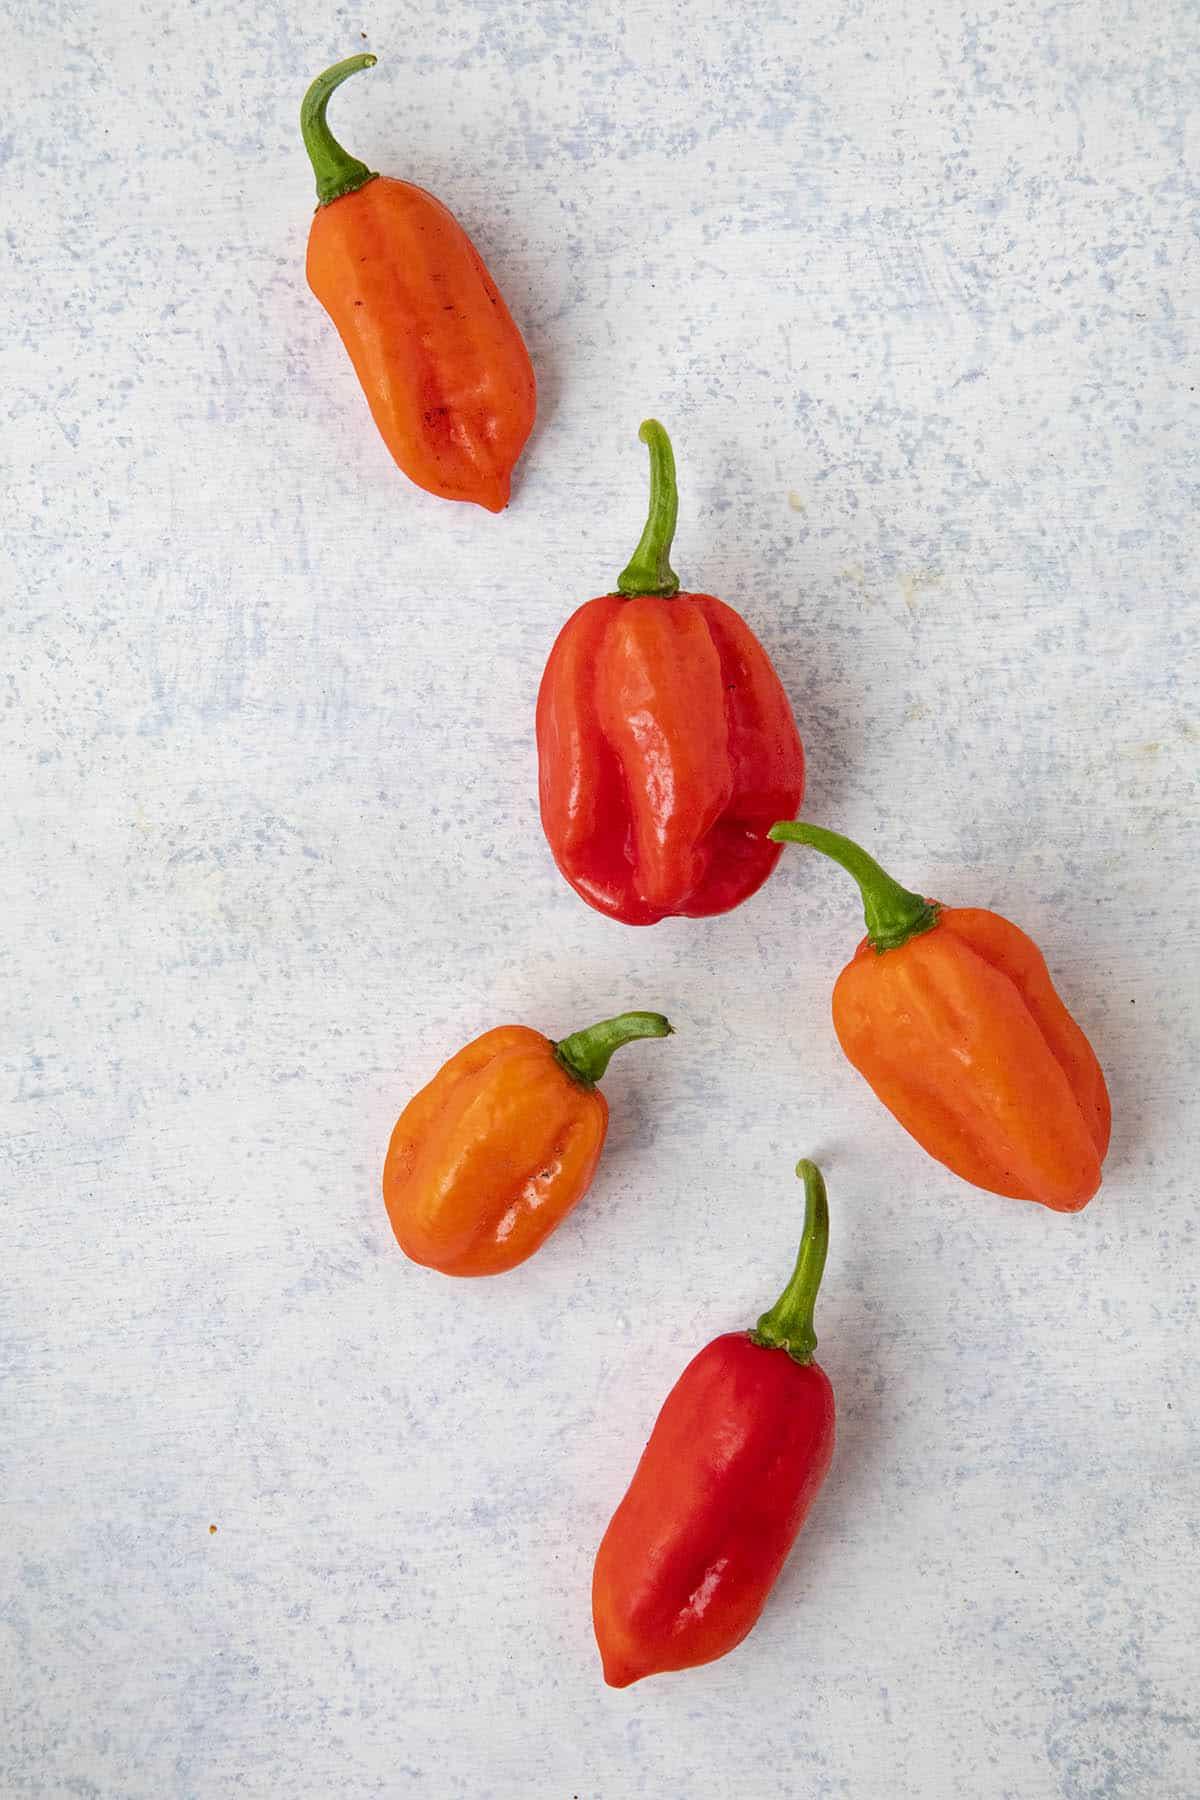 Aji Dulce Chili Peppers